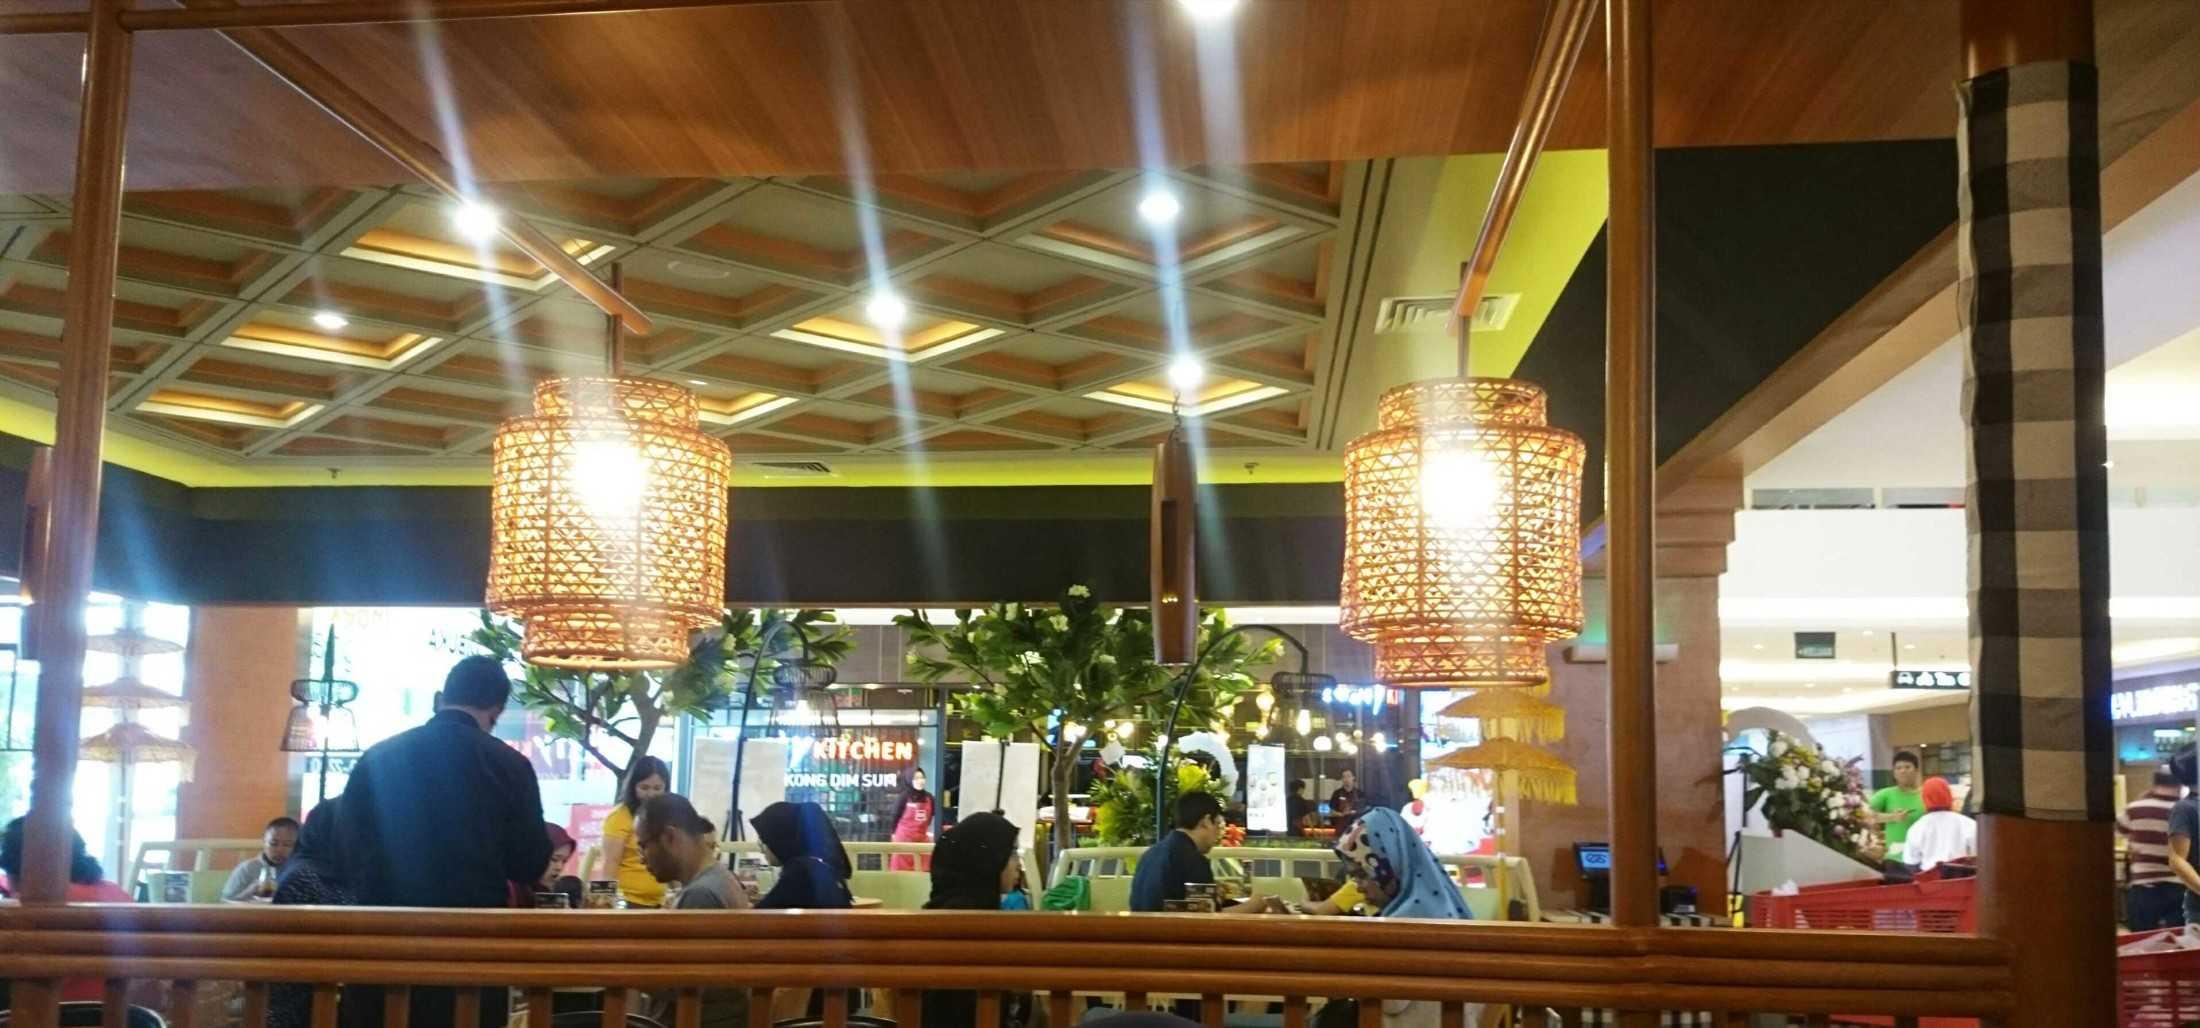 Alradistadesign Warung Wardani, Jakarta Jakarta, Daerah Khusus Ibukota Jakarta, Indonesia Jakarta, Daerah Khusus Ibukota Jakarta, Indonesia Alradistadesign-Warung-Wardani-Jakarta  64766